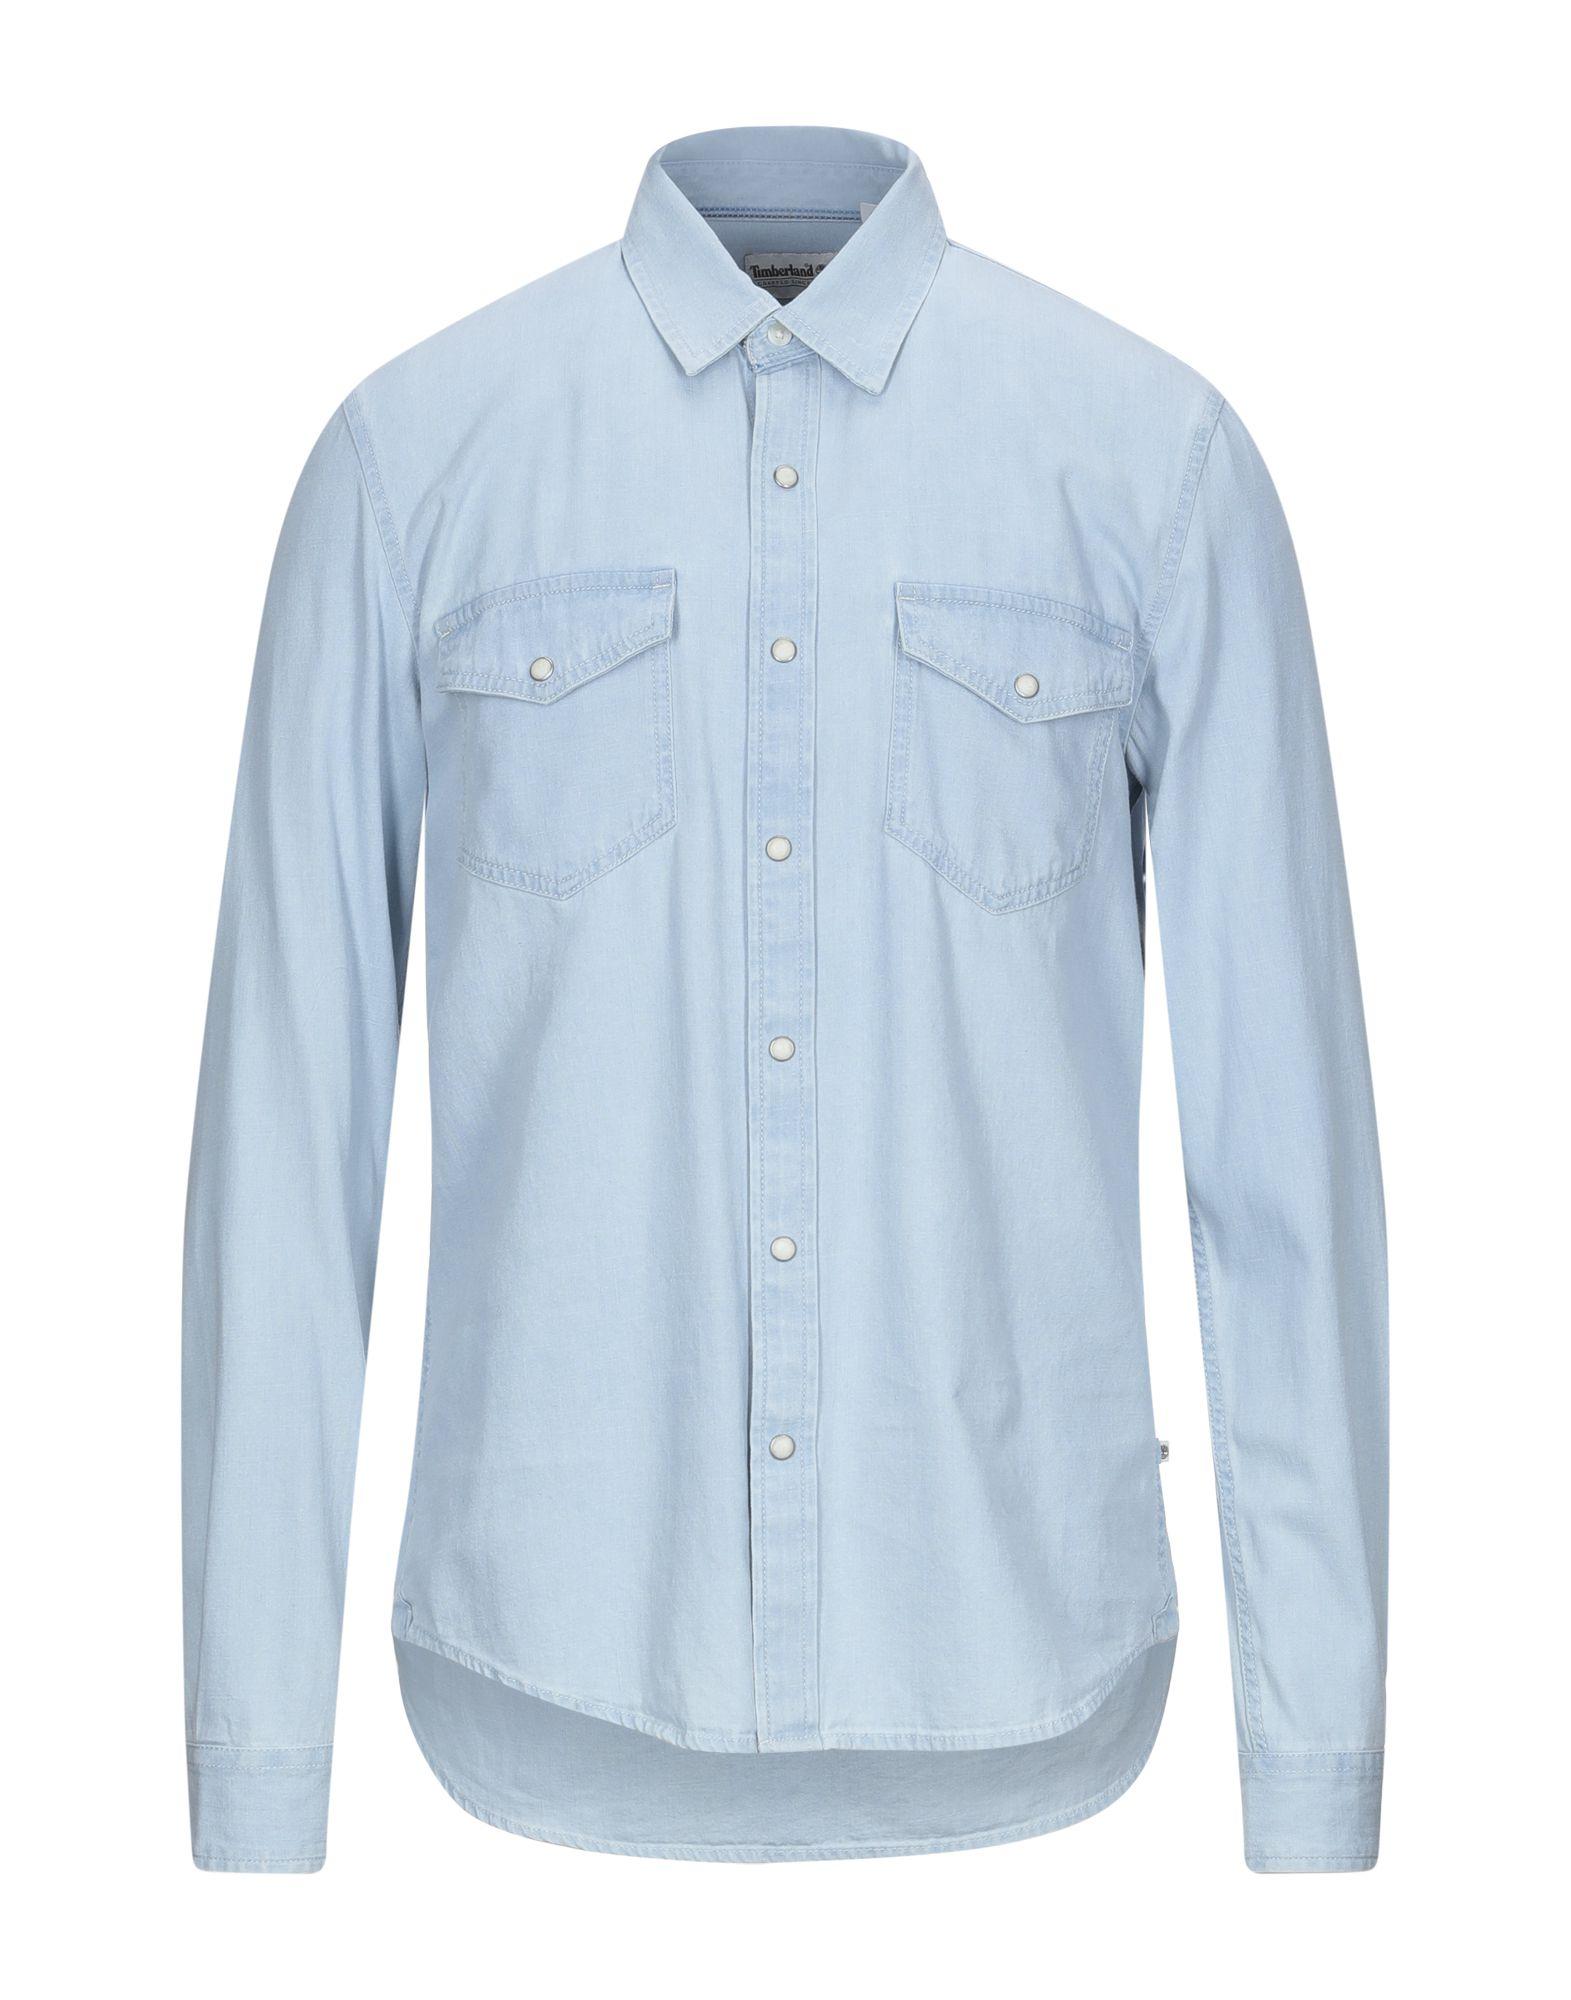 TIMBERLAND Denim shirts - Item 42814981